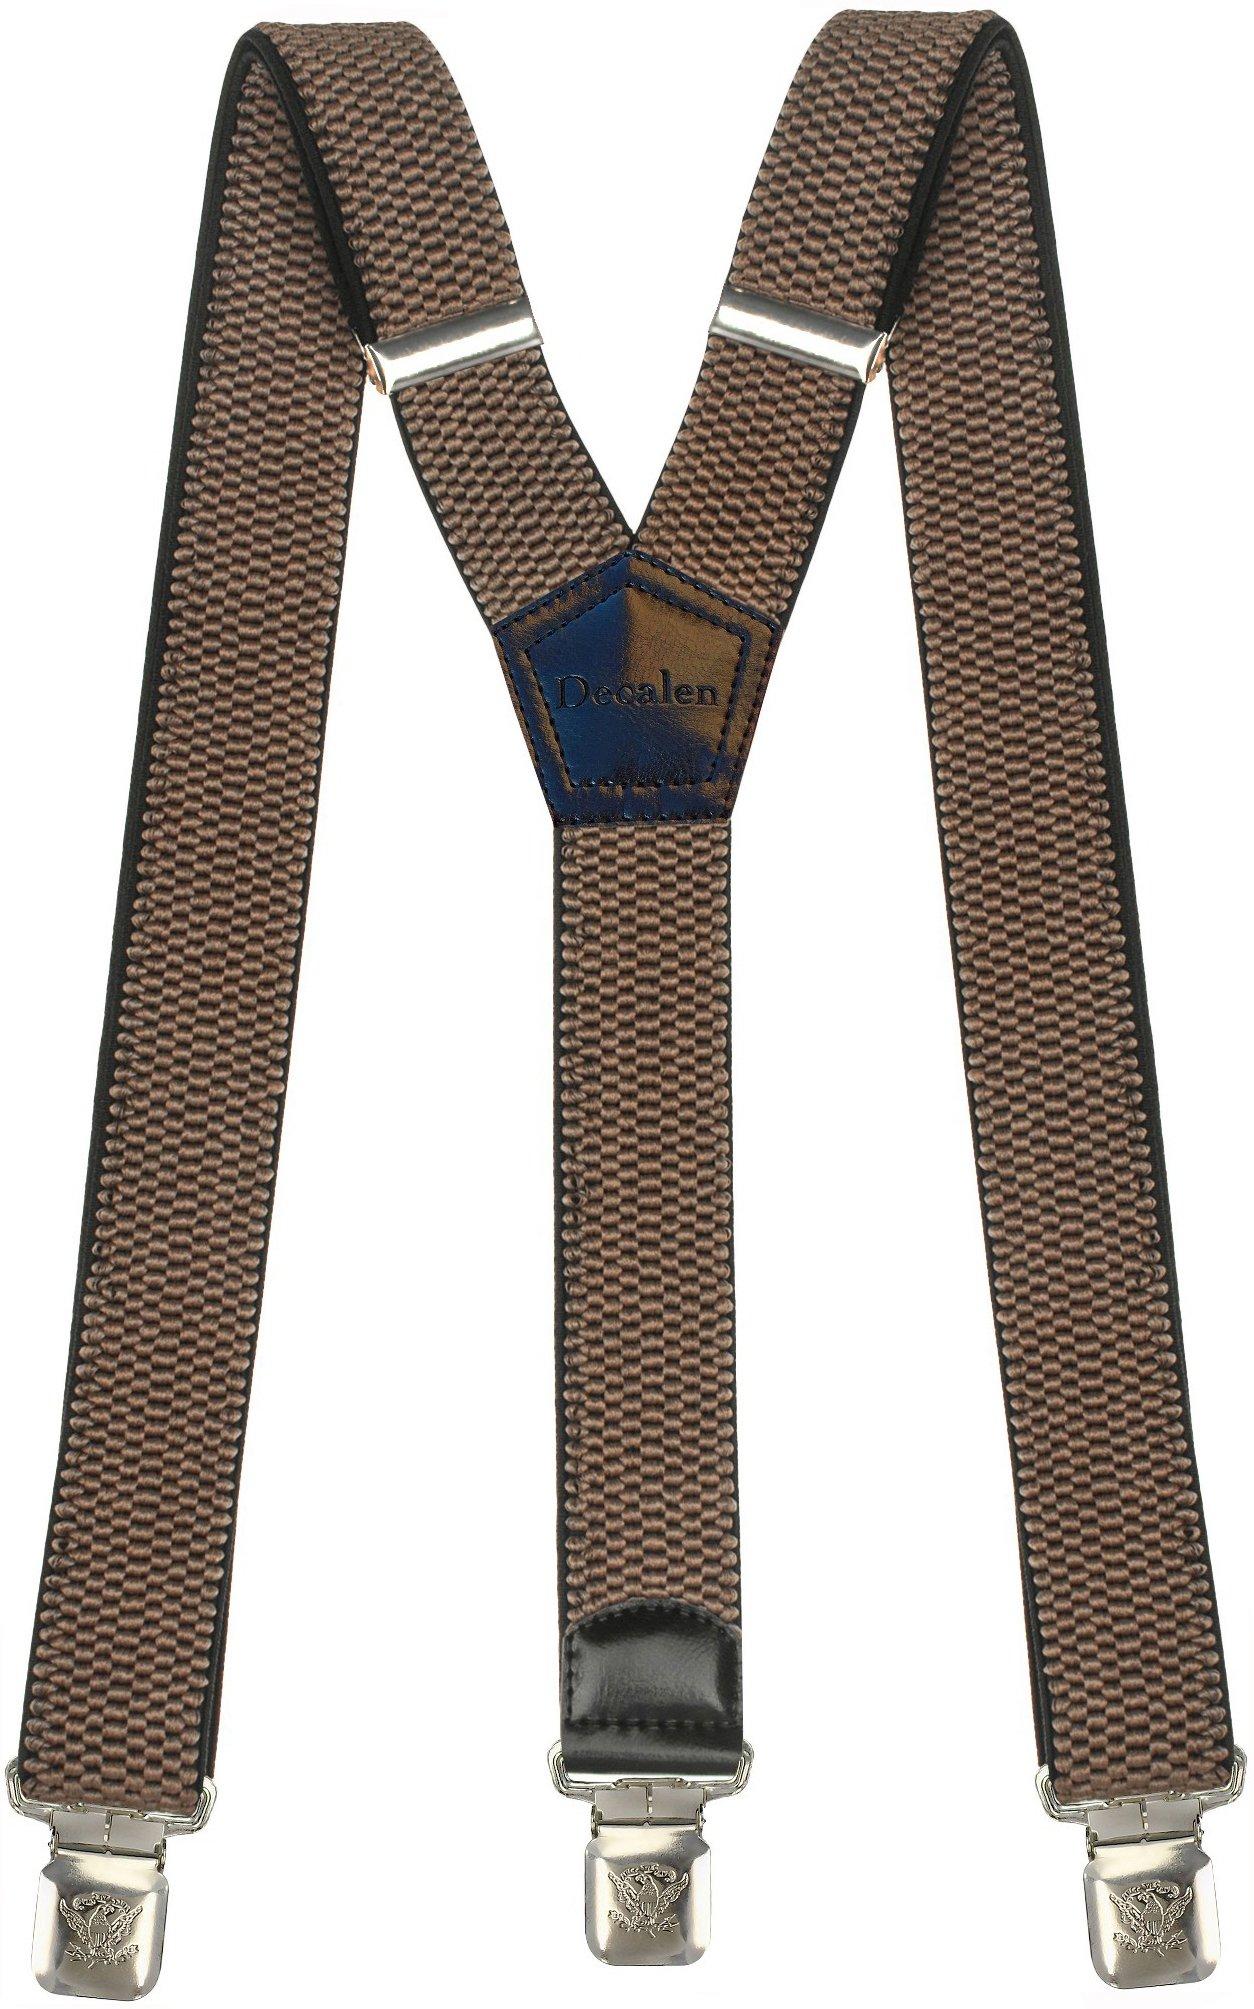 Msendro Men's Suspenders Y Shape Adjustable Elastic Heavy Duty Clip on Braces X-Large Dark Beige